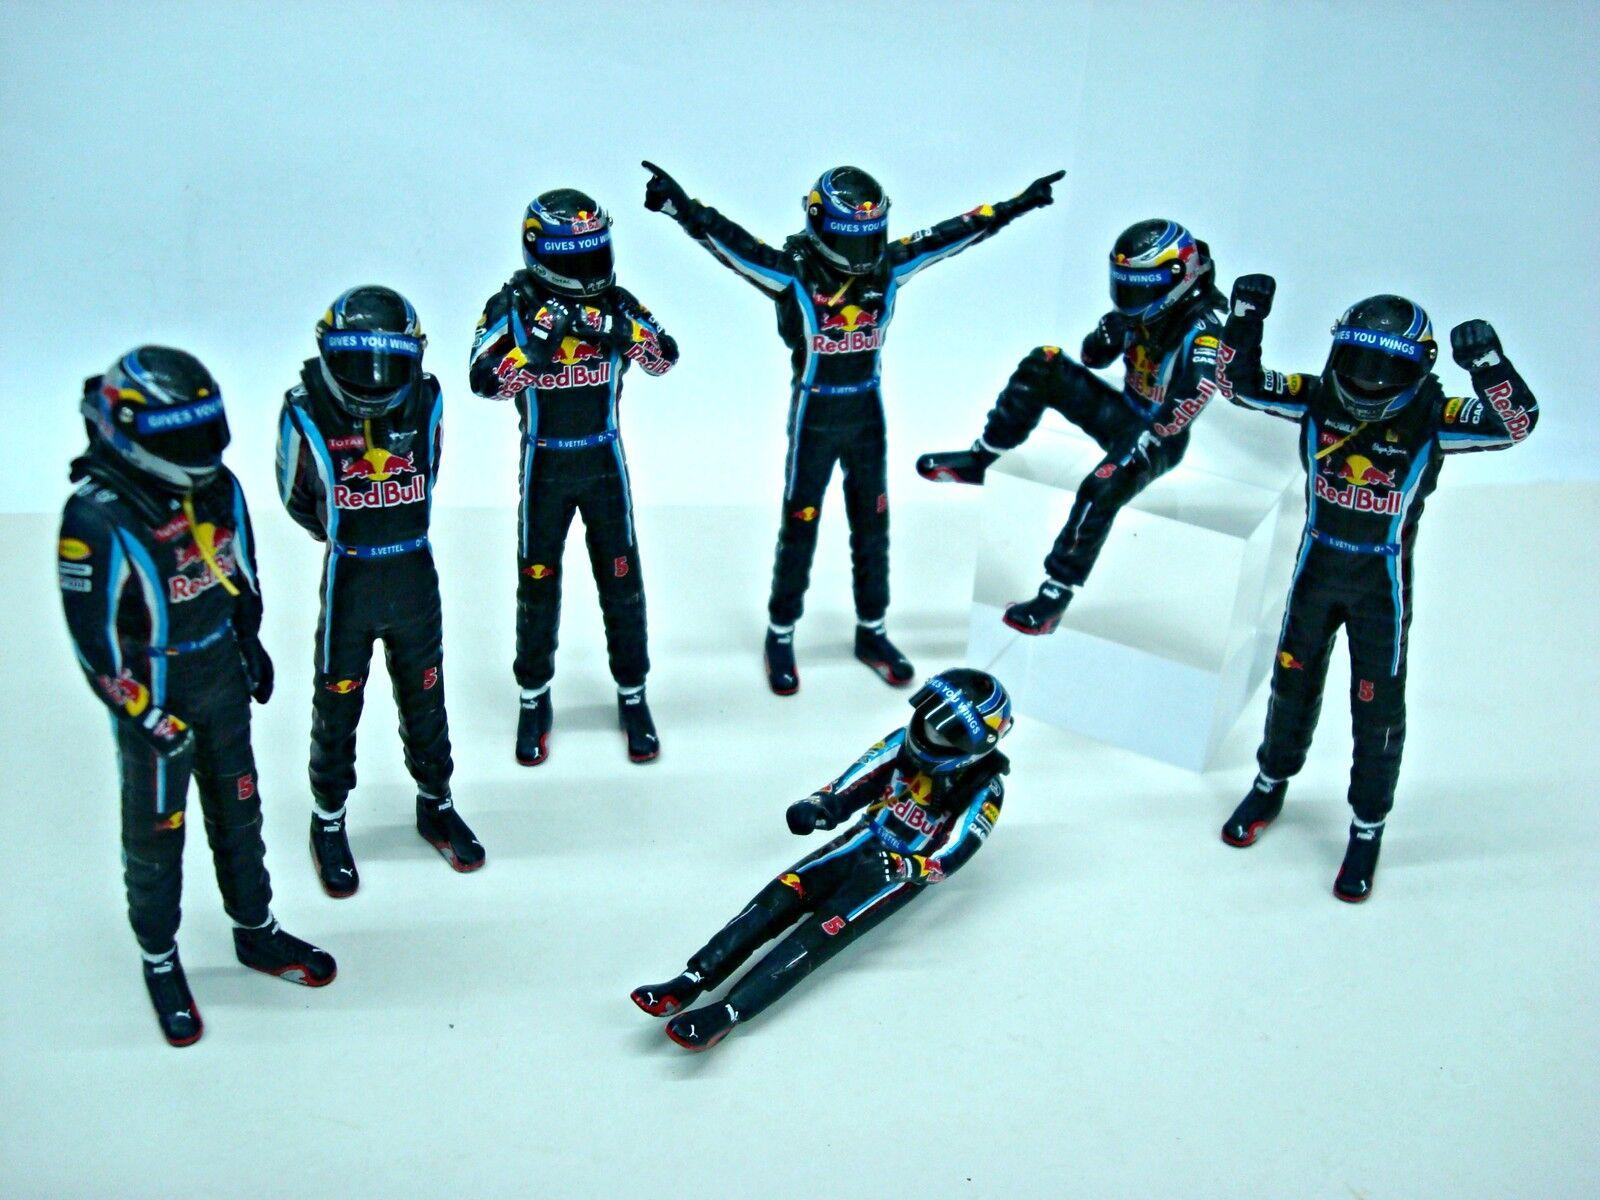 Figures f1 d58i Vettel 2010 World Champions Standing Driver 1 18 Hands helmet